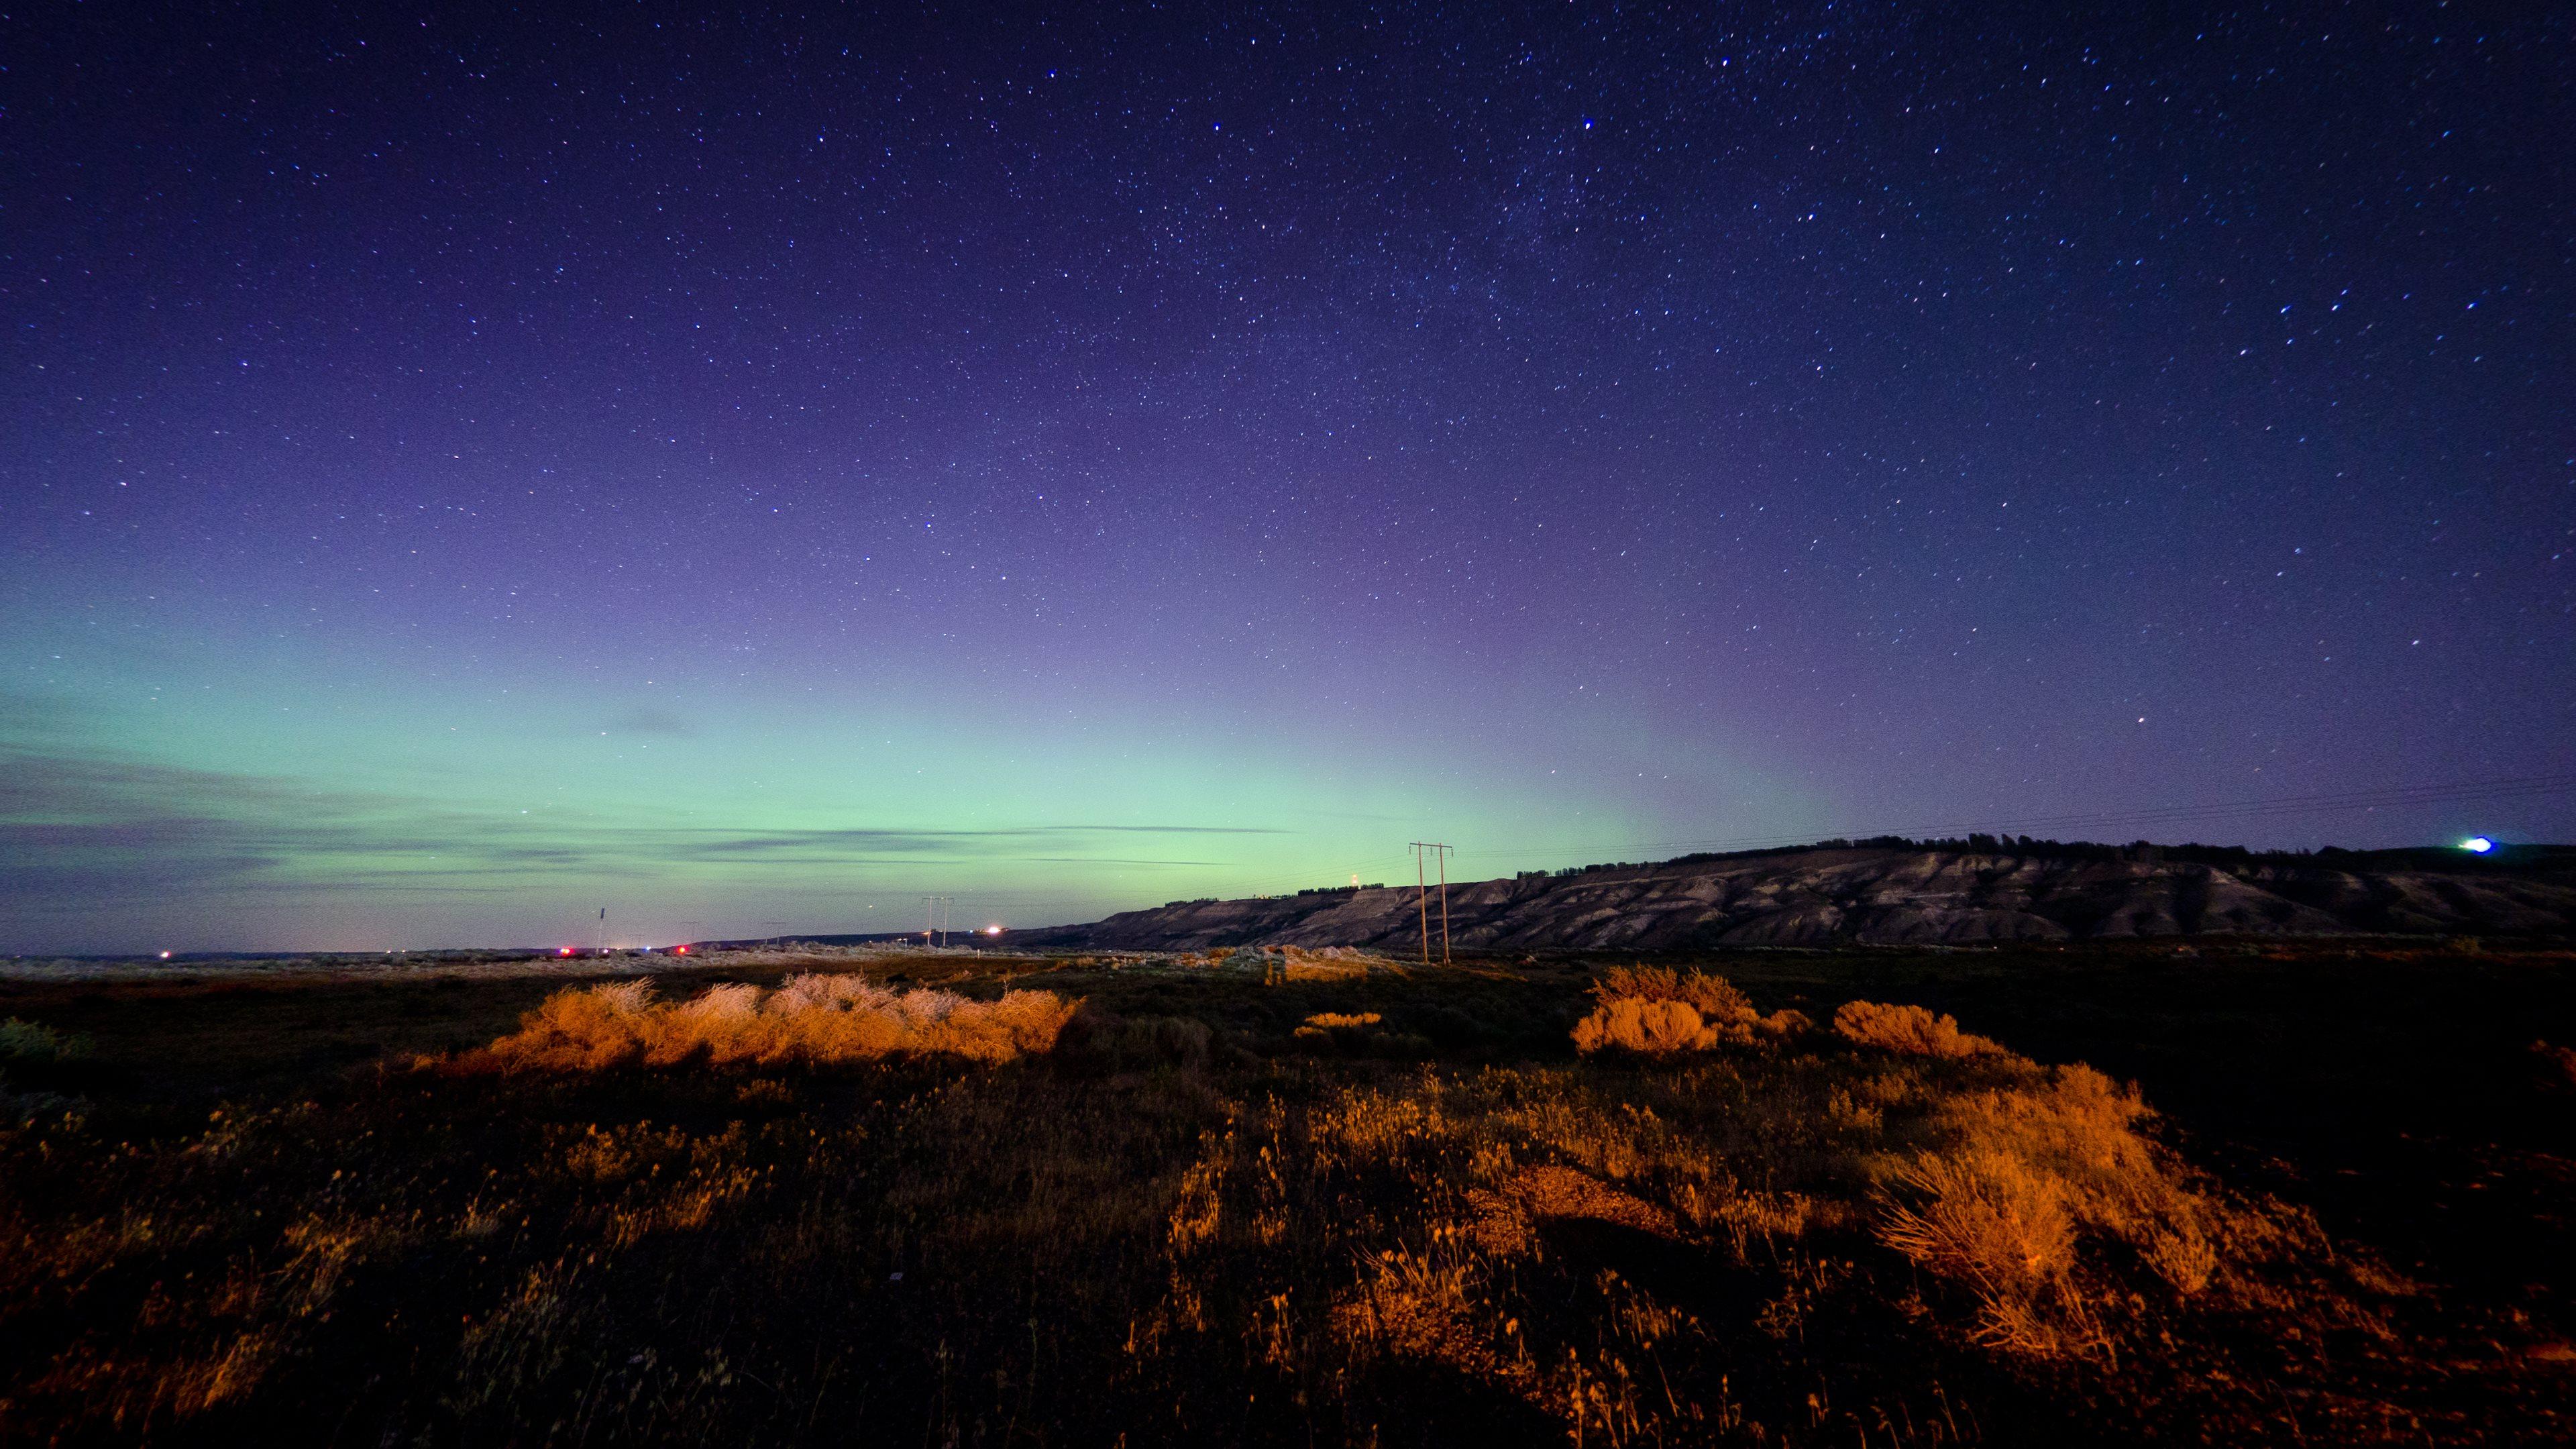 northern lights wallpaper 4k - photo #25